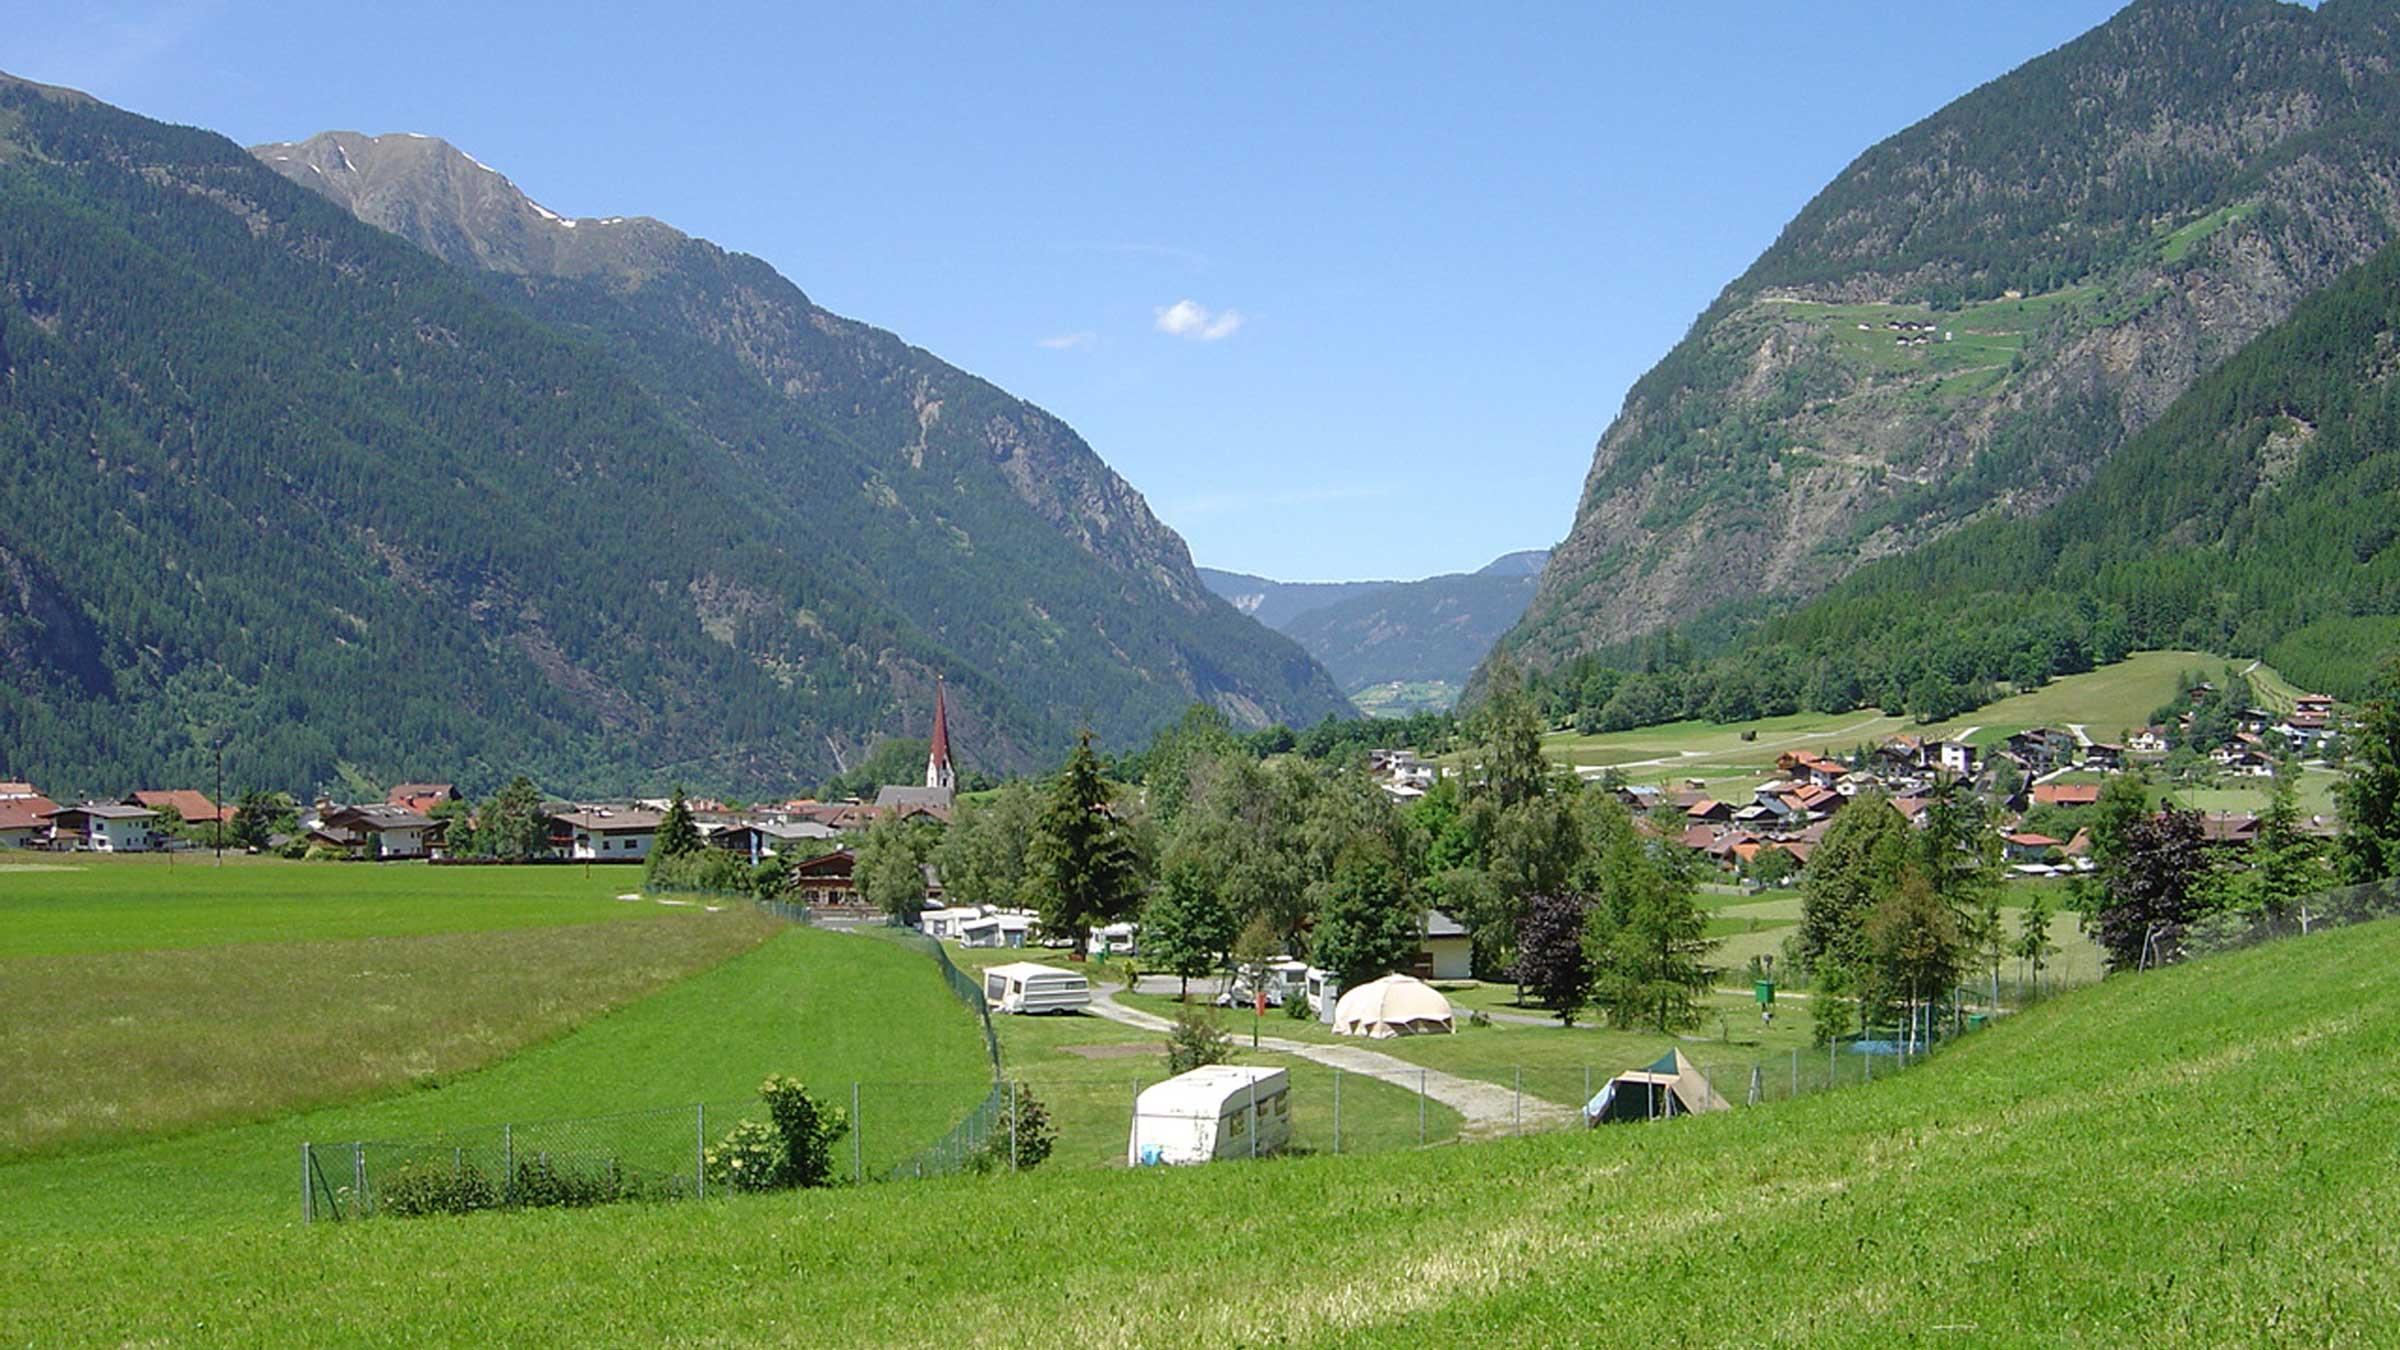 Campingplatz Umhausen - Camping im Ötztal